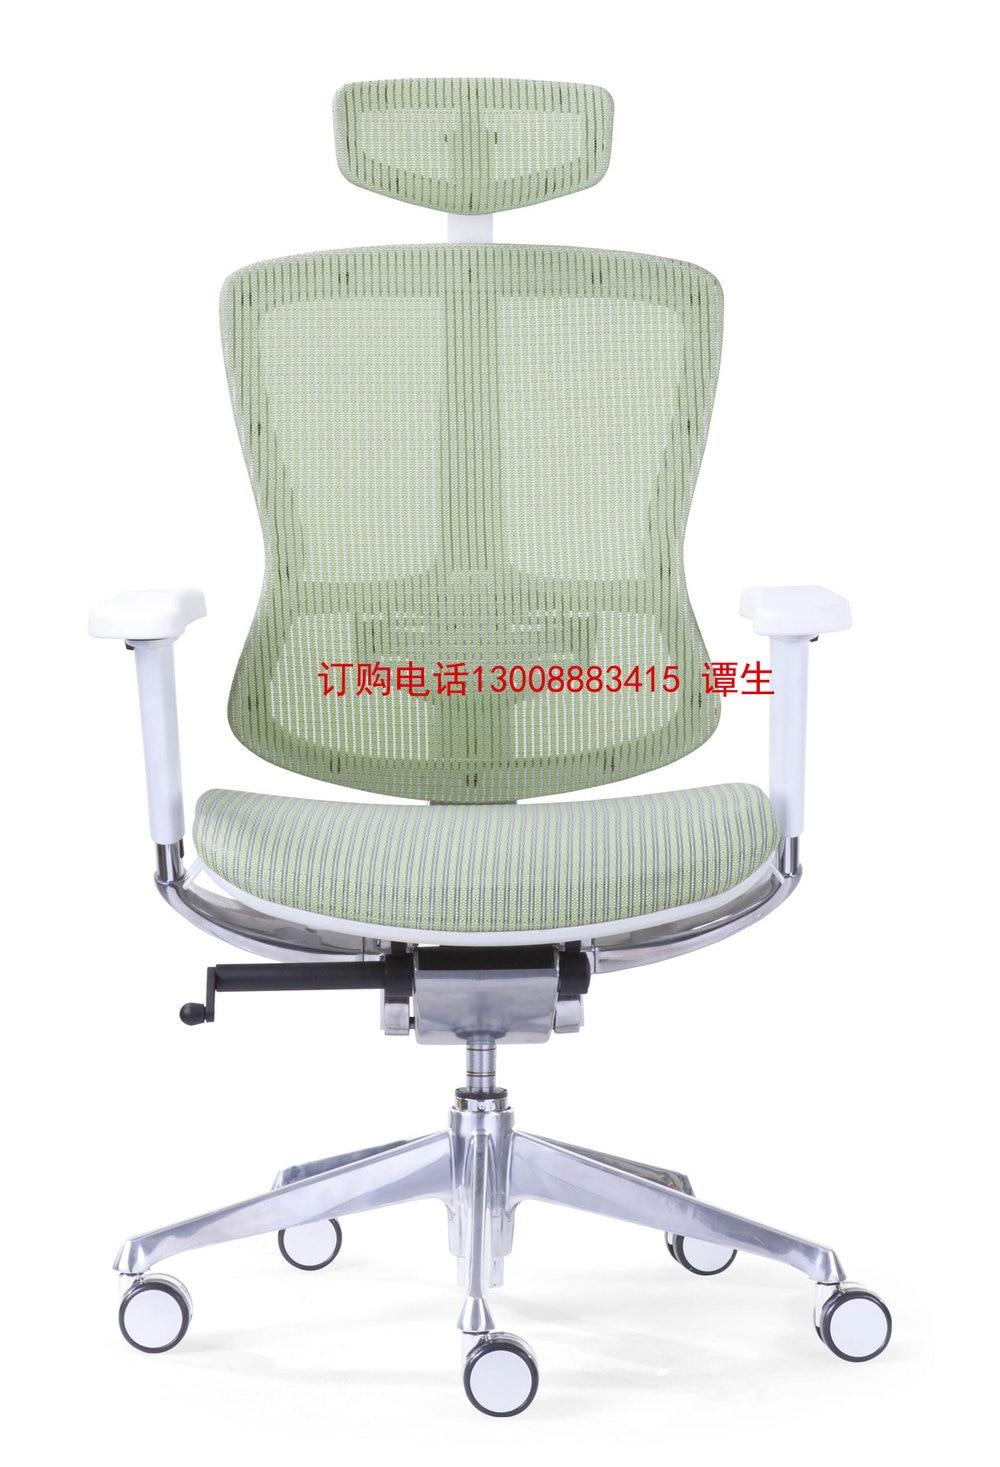 Luxury High End Mesh Chair Reclining Chair Lift Boss Stylish